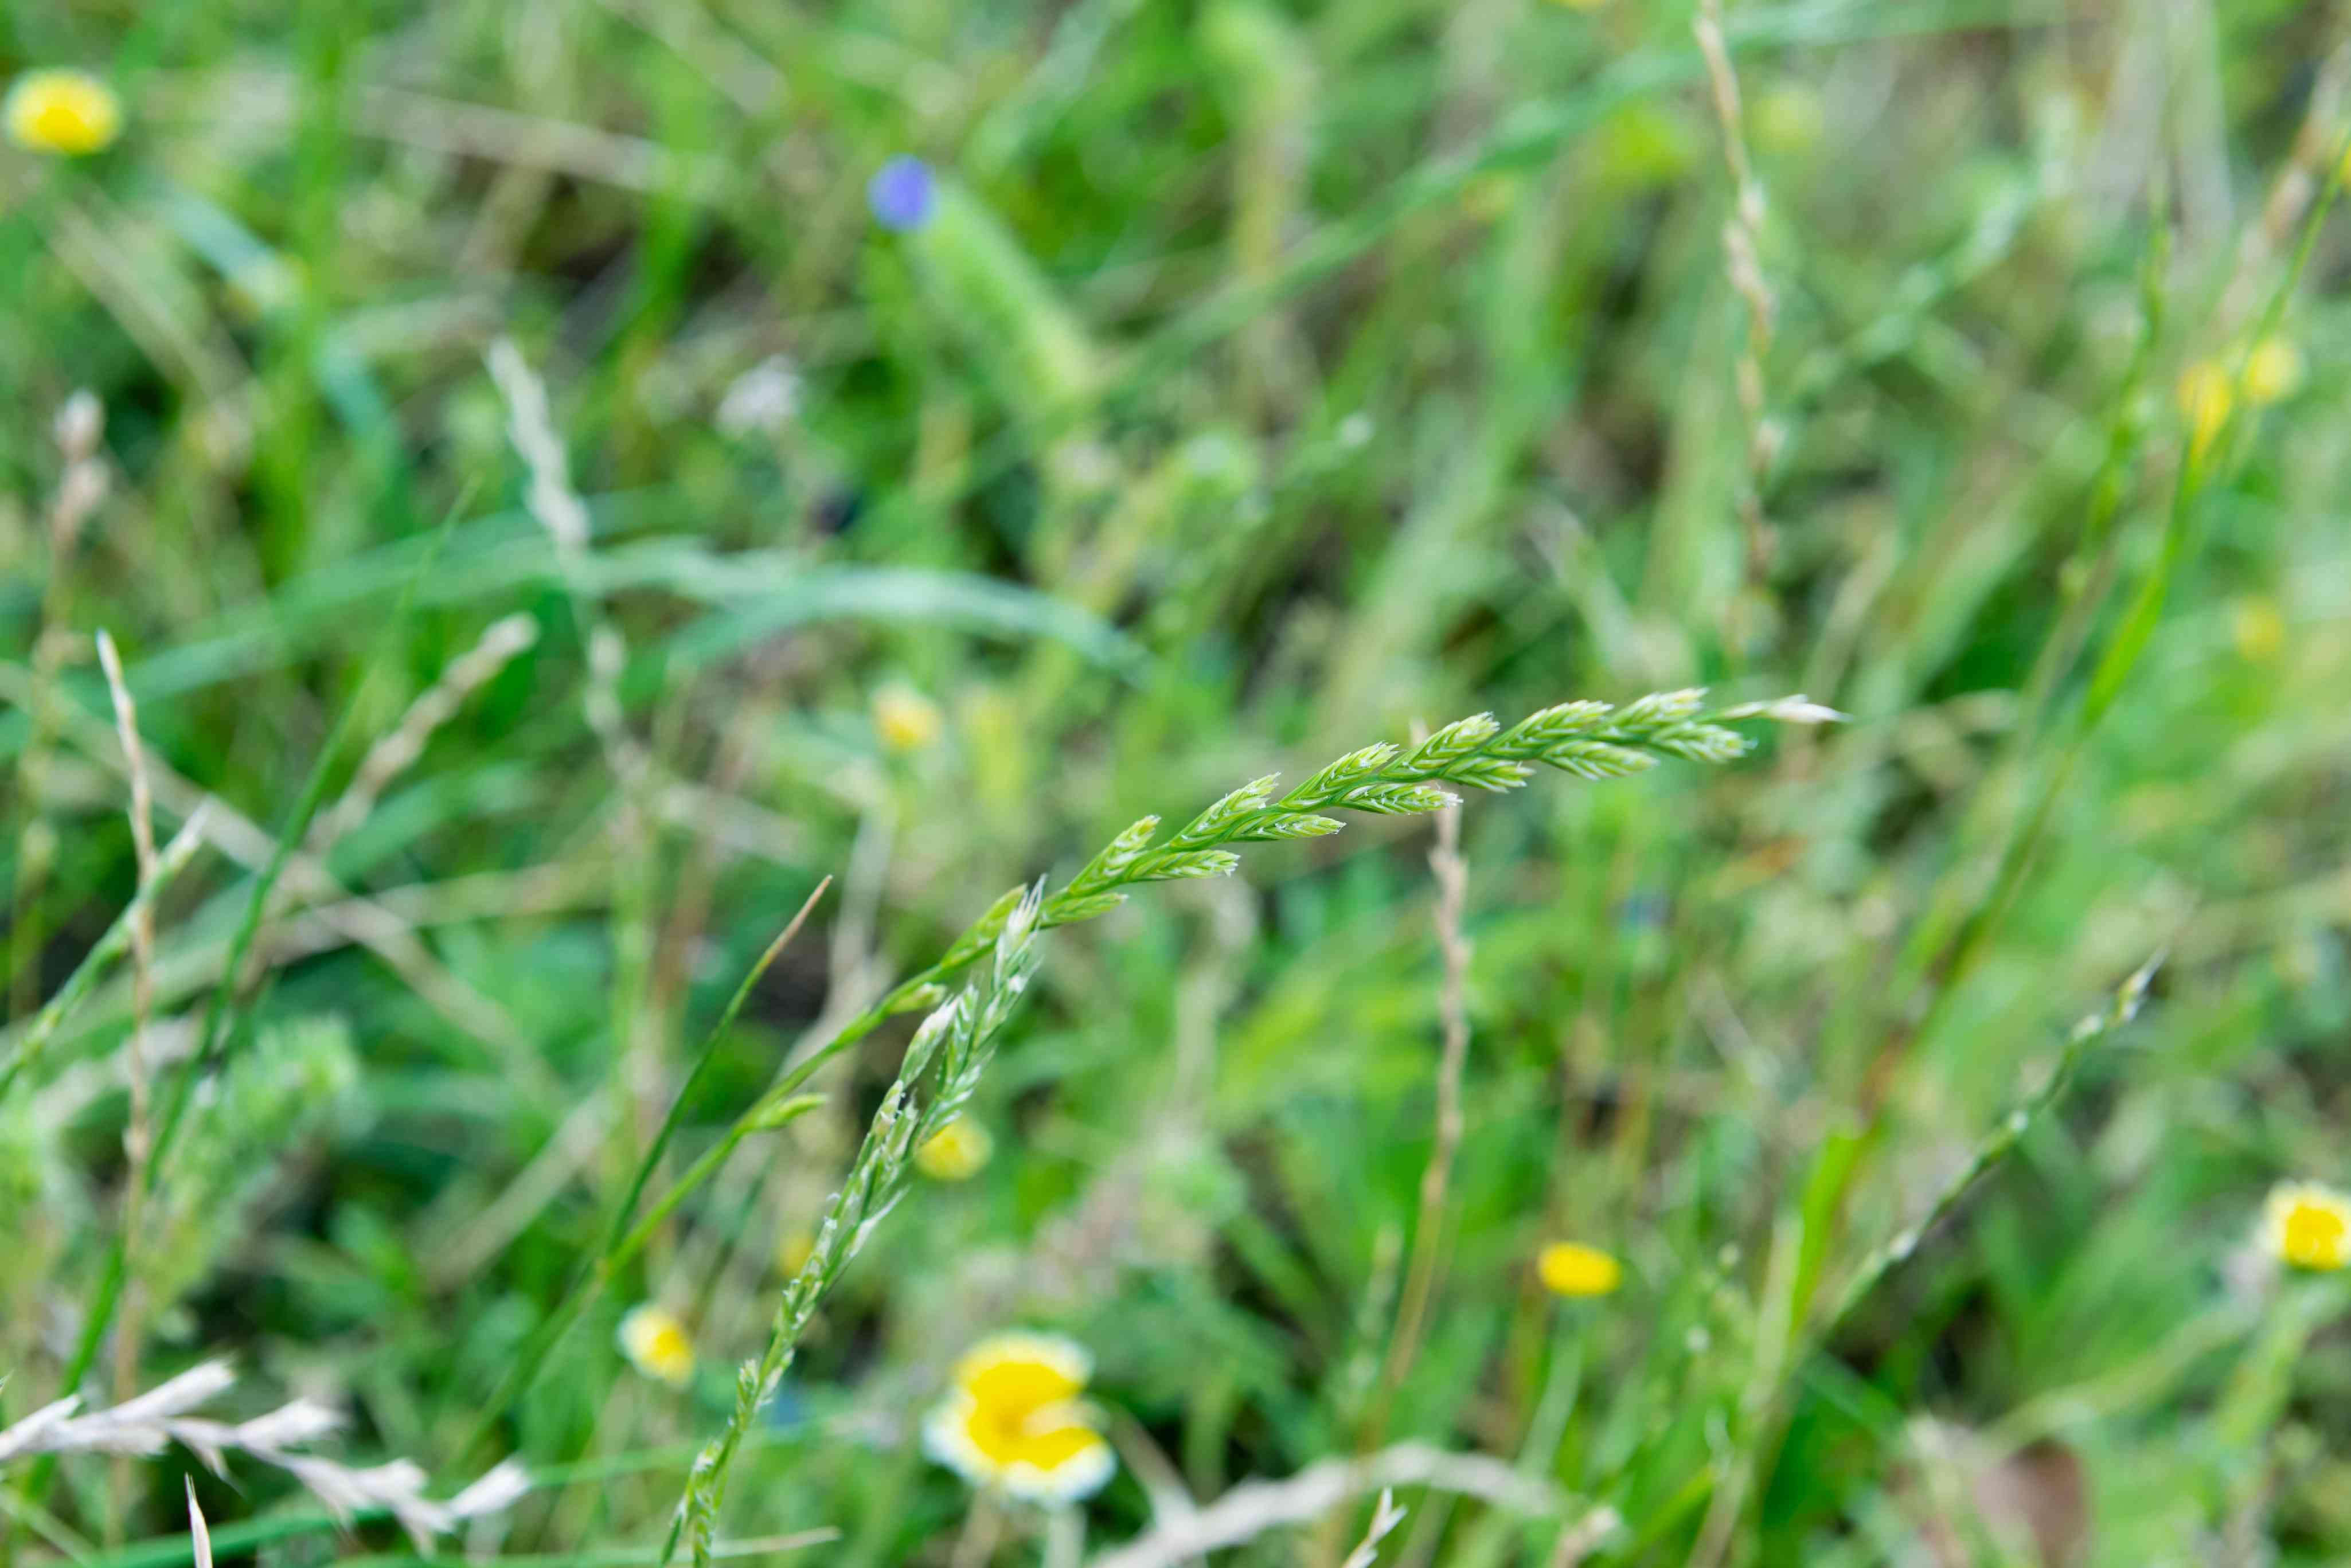 Perennial ryegrass blade with seeds on end closeup